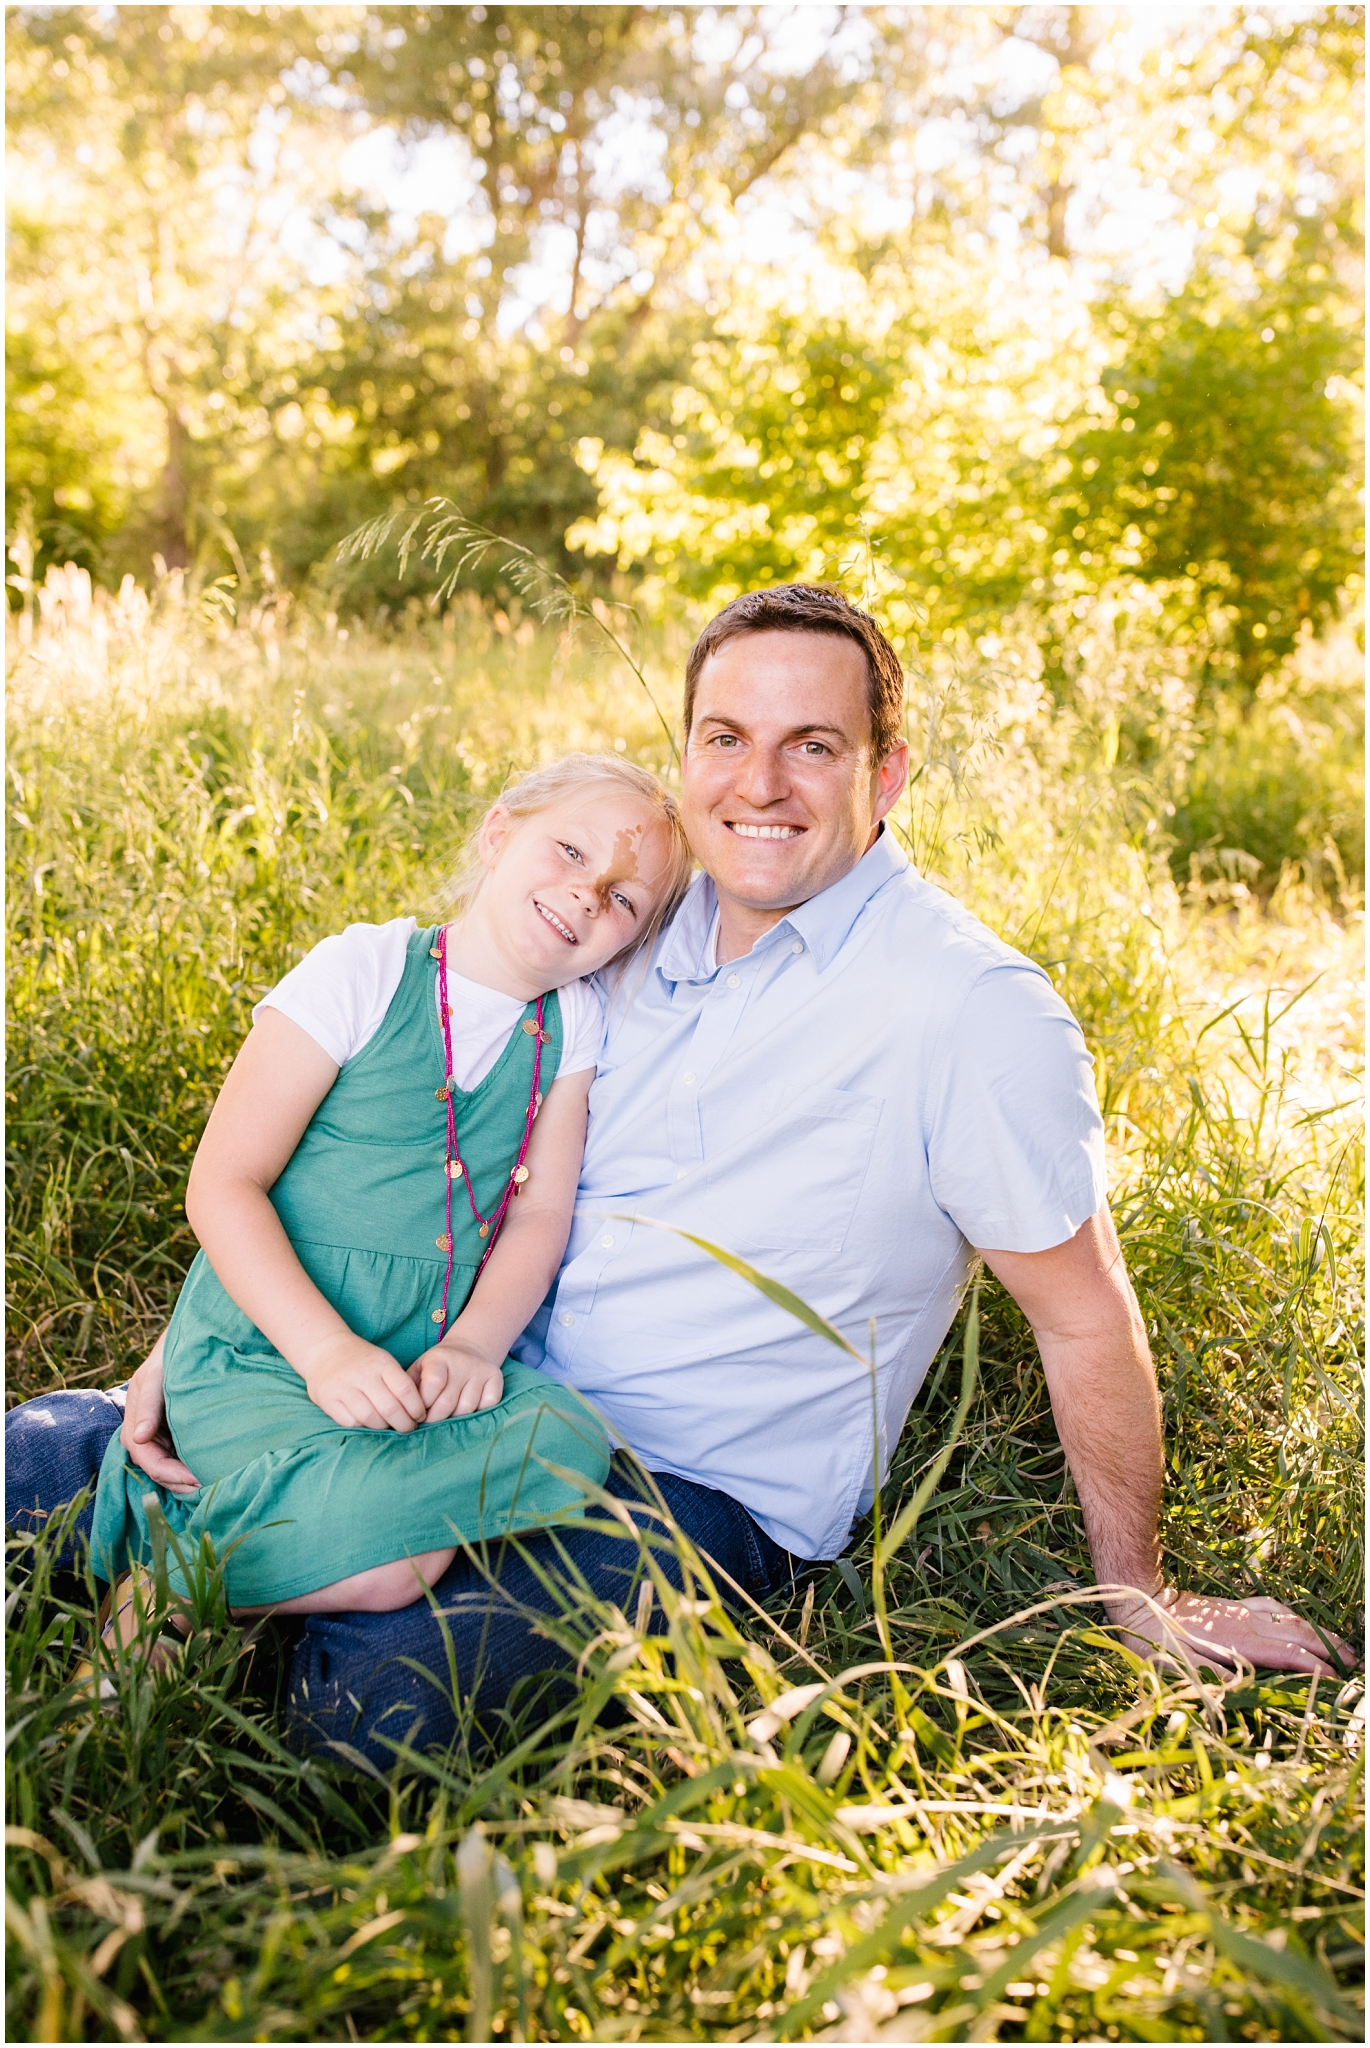 Henderson-20_Lizzie-B-Imagery-Utah-Family-Photographer-Park-City-Salt-Lake-City-Springville-Hobble-Creek-Canyon-Jolleys-Ranch.jpg